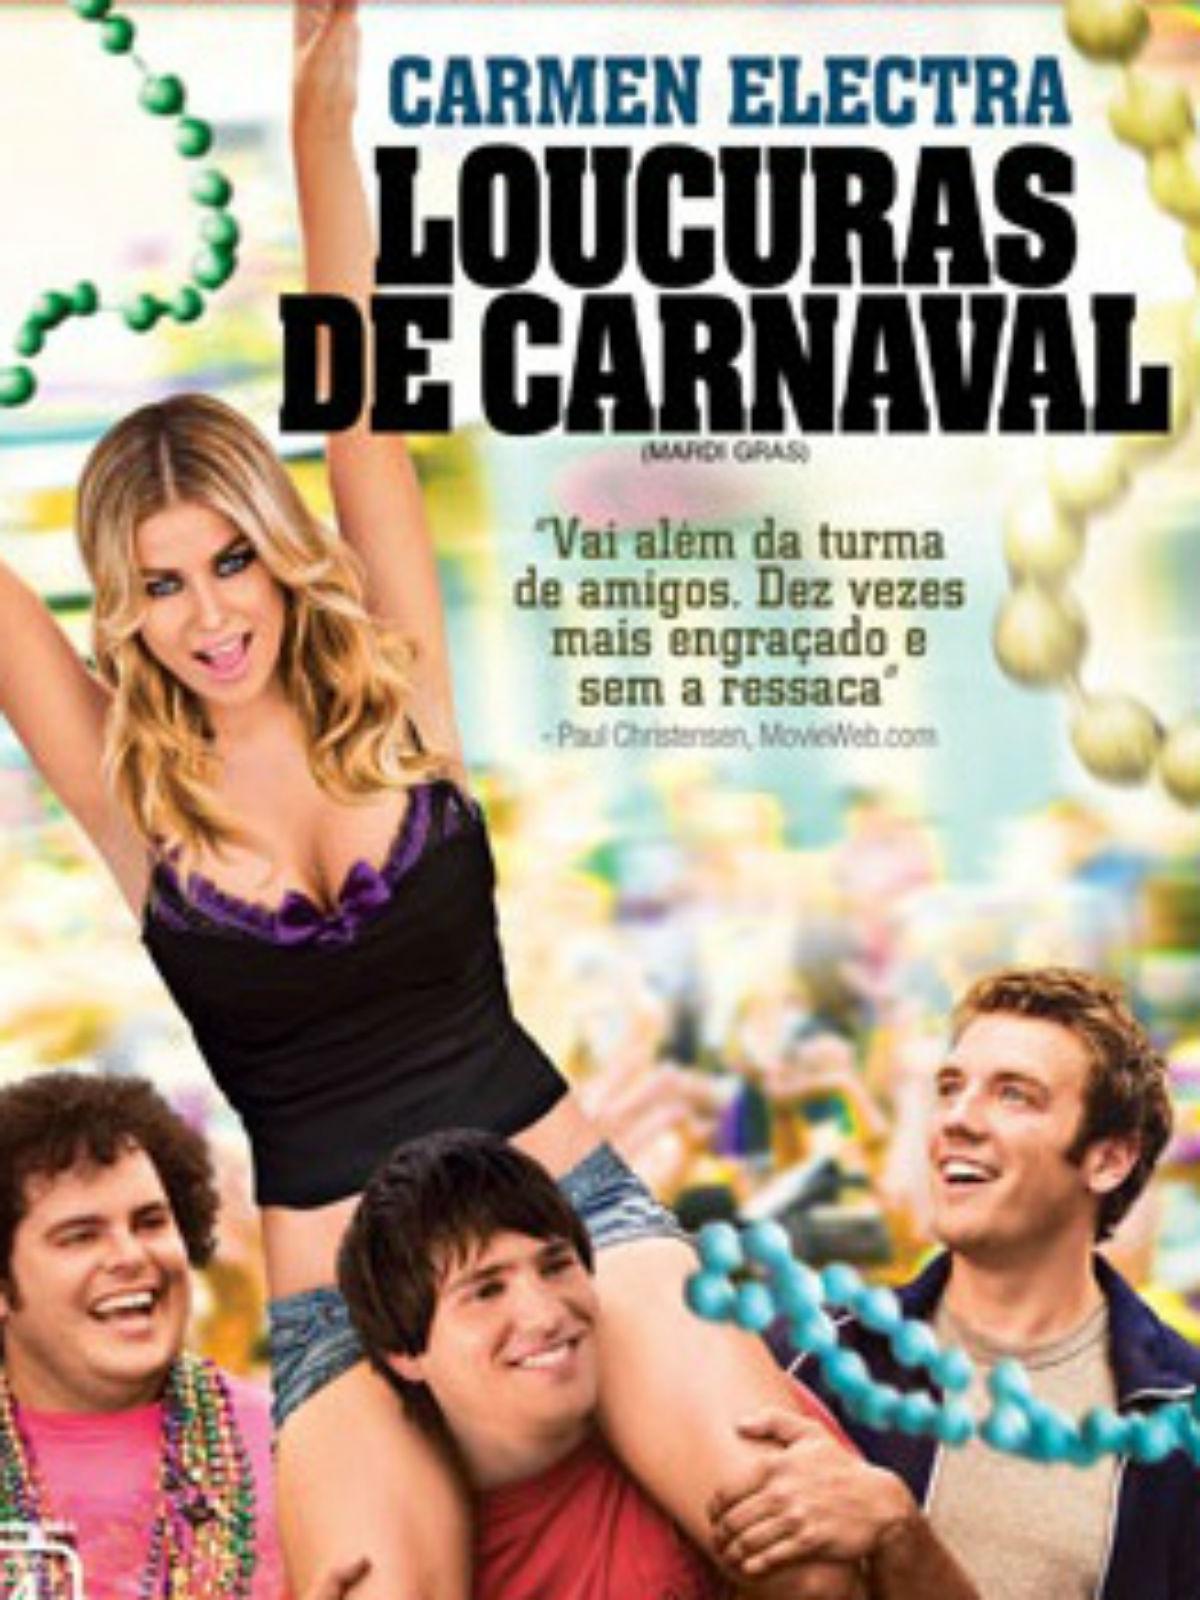 loucuras de carnaval dublado gratis